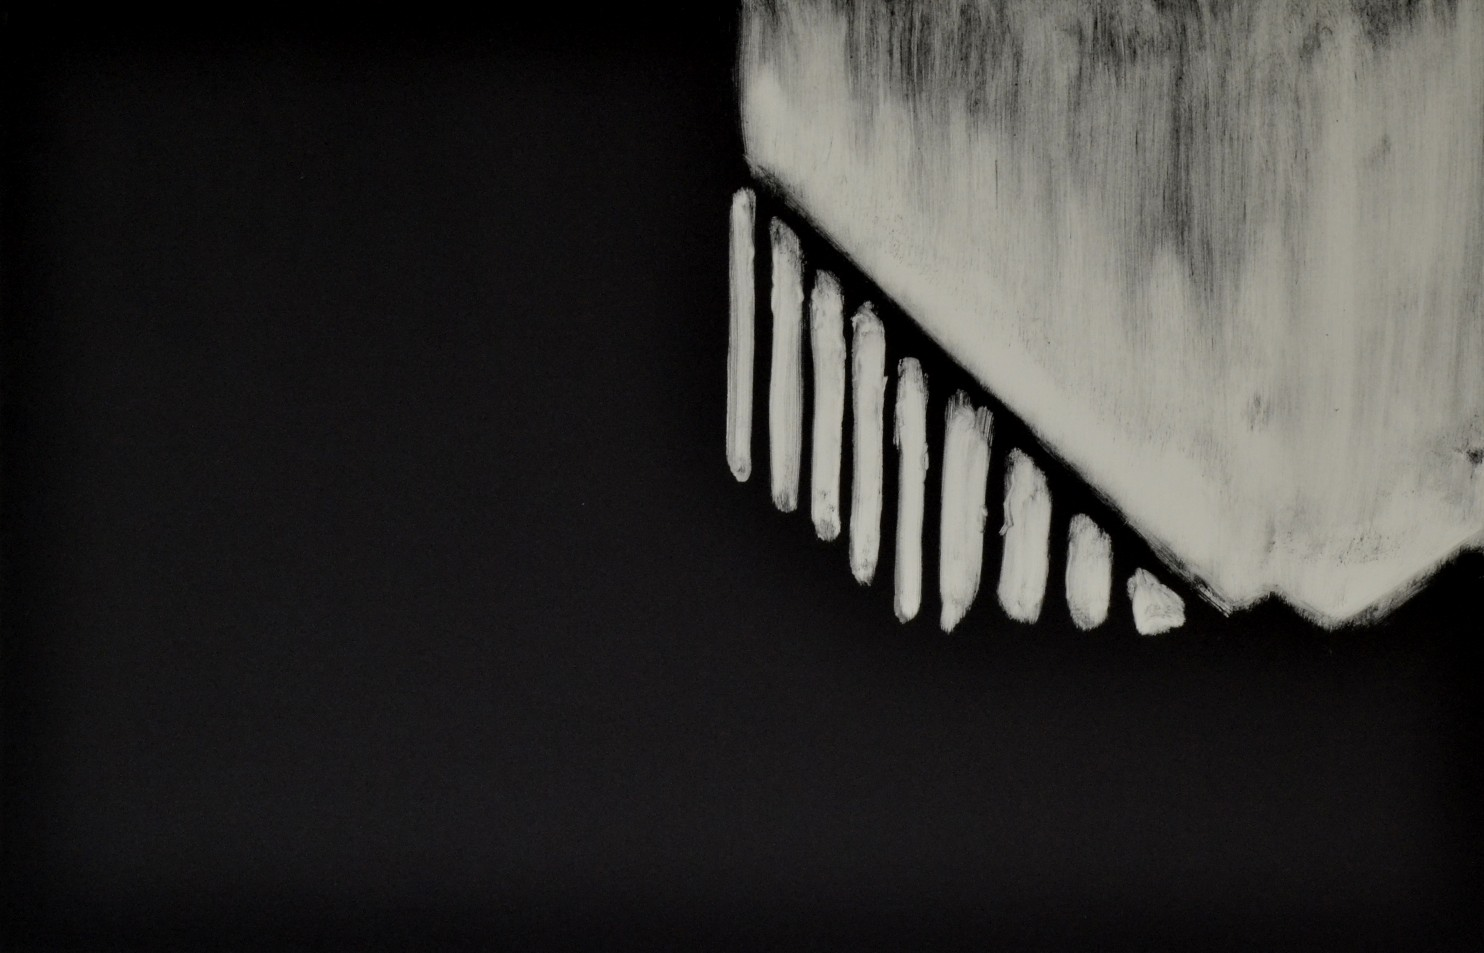 Into the Night (VII)